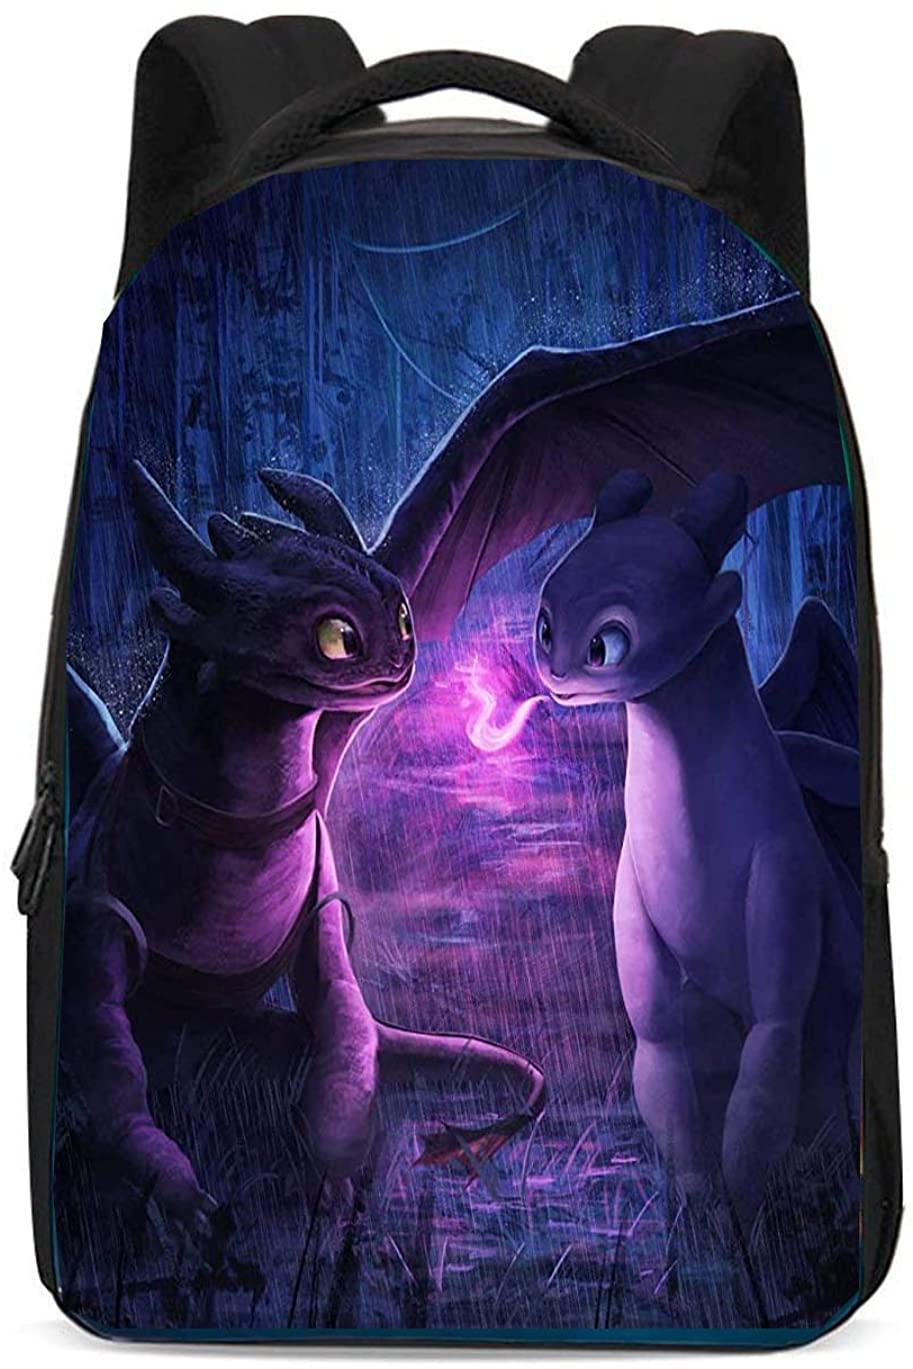 Train Dragon Backpack Your School Bag for Boys Girls